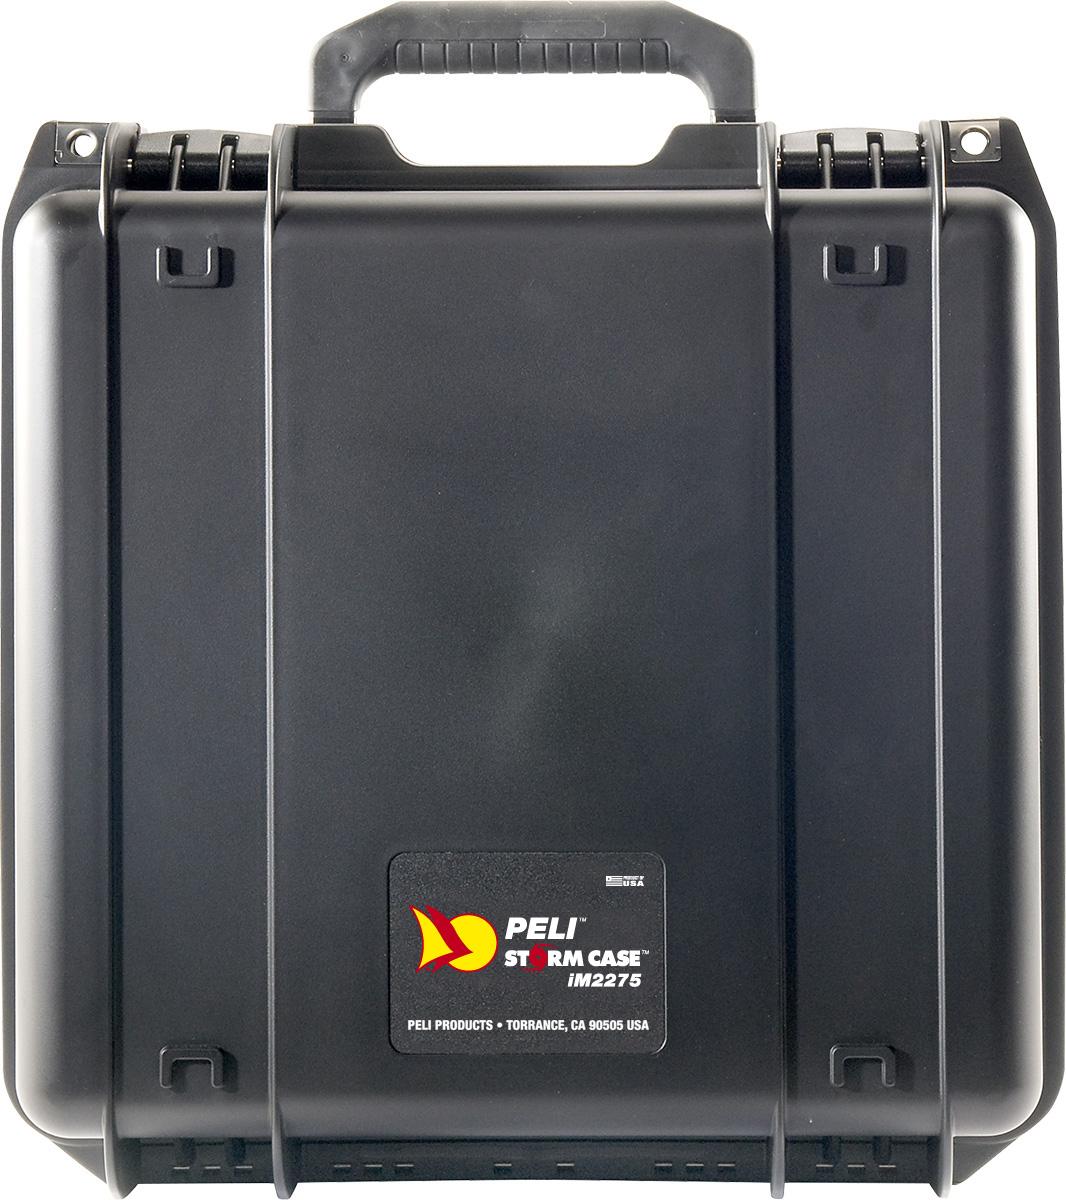 peli drone hard cases im 2275